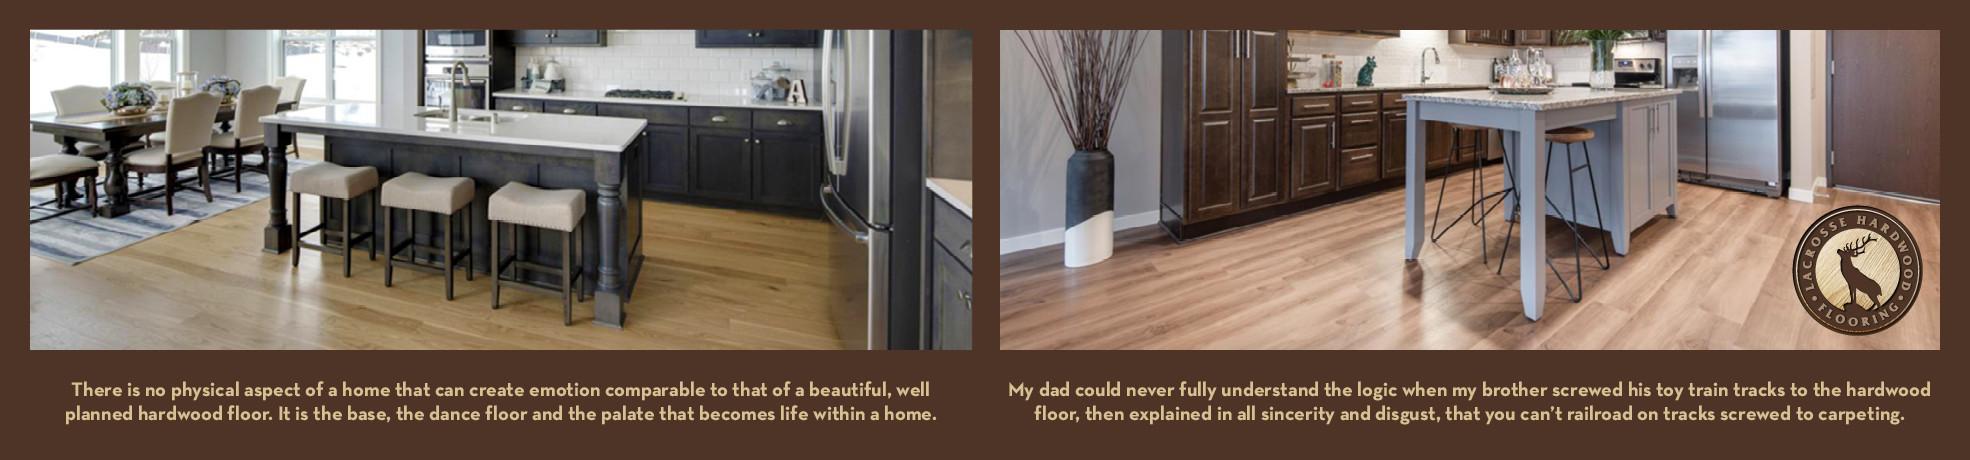 warm hardwood floor colors of lacrosse hardwood flooring walnut white oak red oak hickory with lhfsliderv24